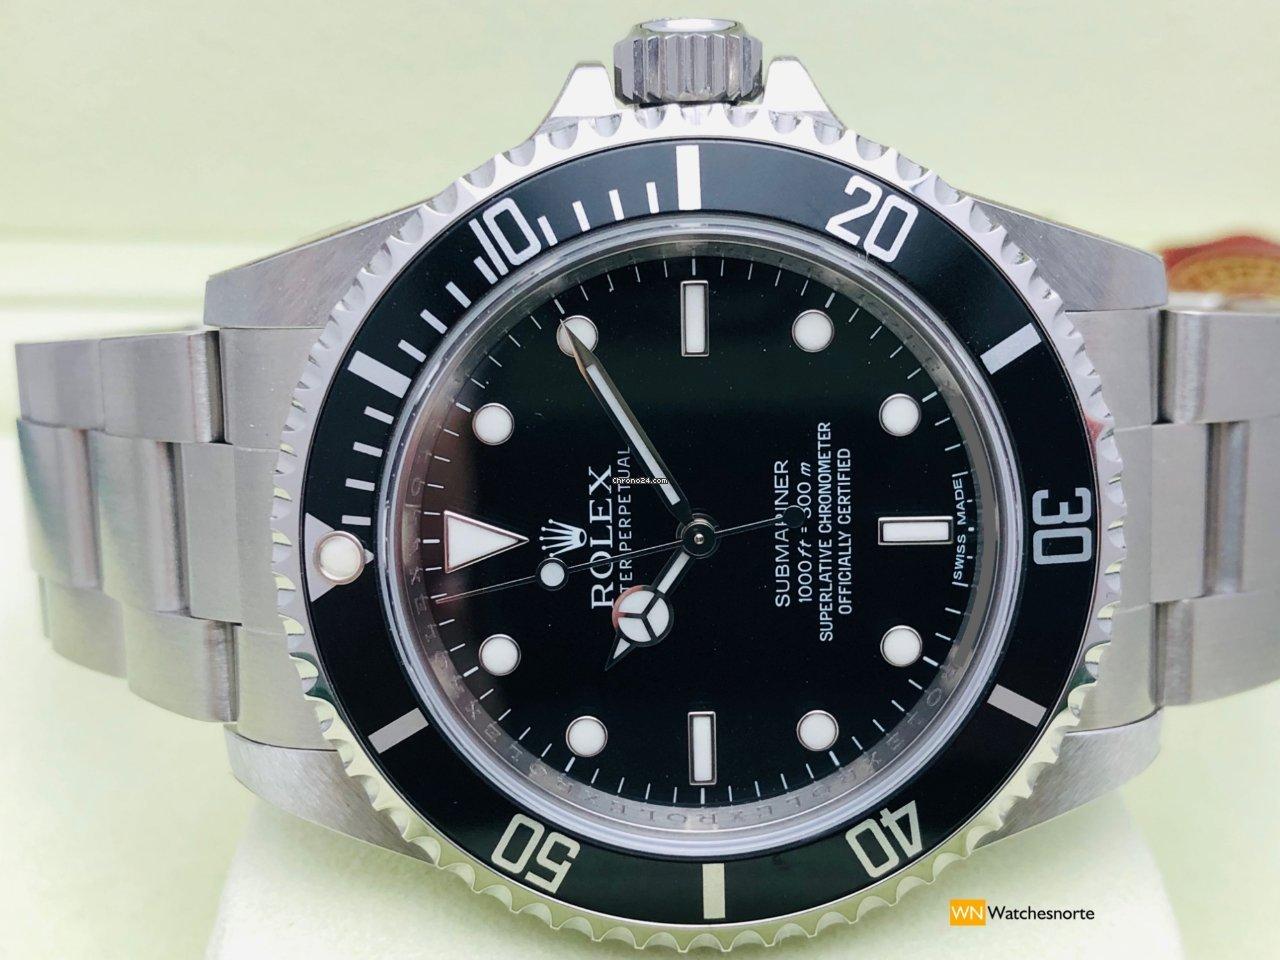 d812dff5e90c Rolex Submariner - Precios de Rolex Submariner en Chrono24